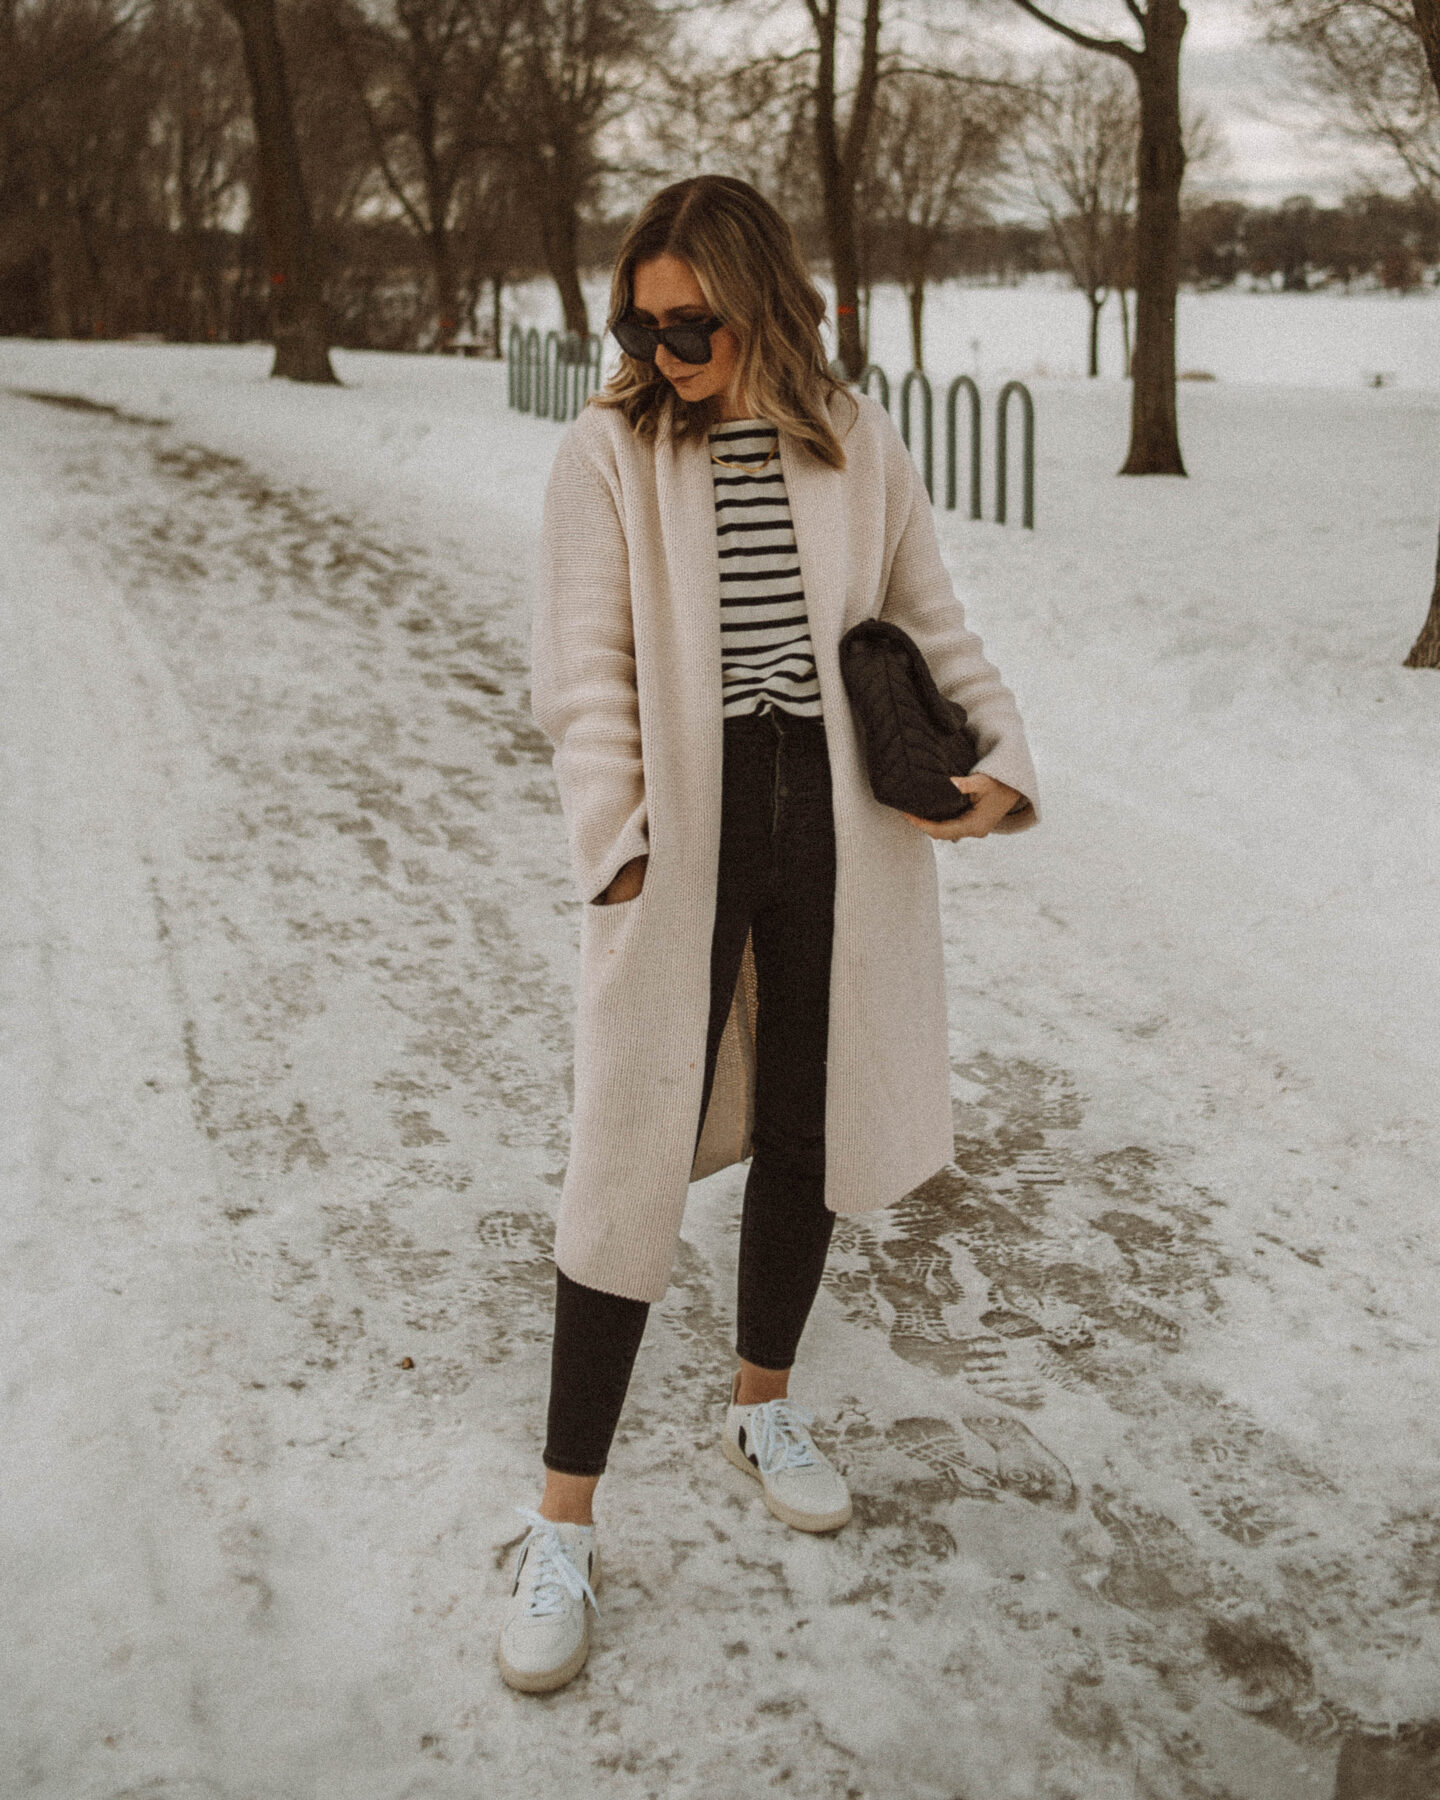 sweater coat, everlane breton stripe tee, everlane authentic stretch skinny jeans, white veja v-10 sneakers